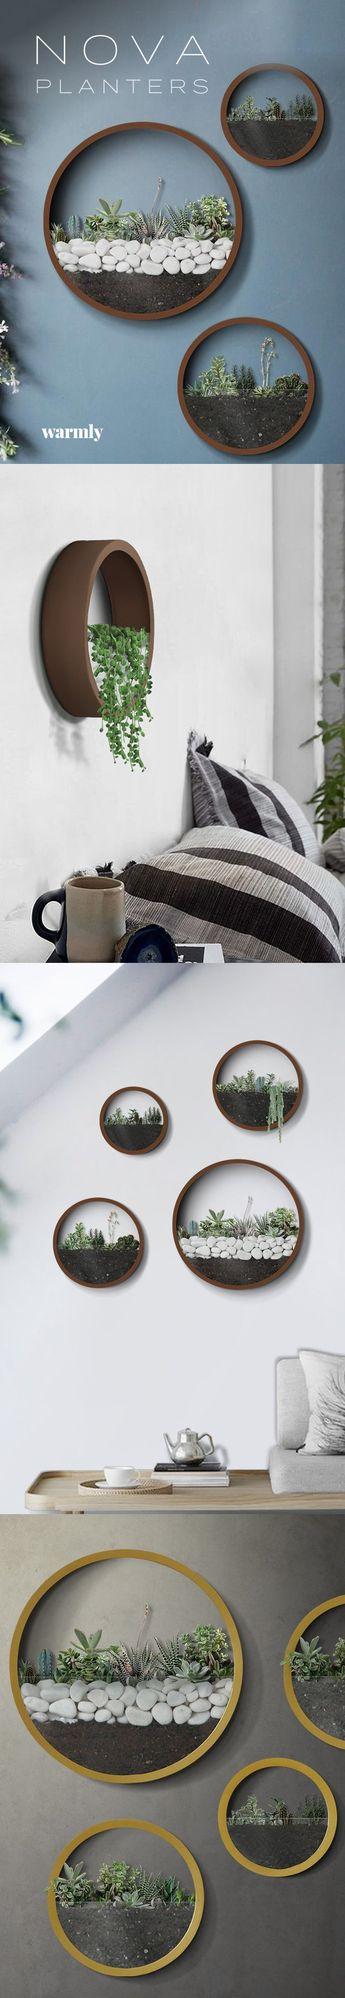 Nova - Modern Nordic Wall Vases